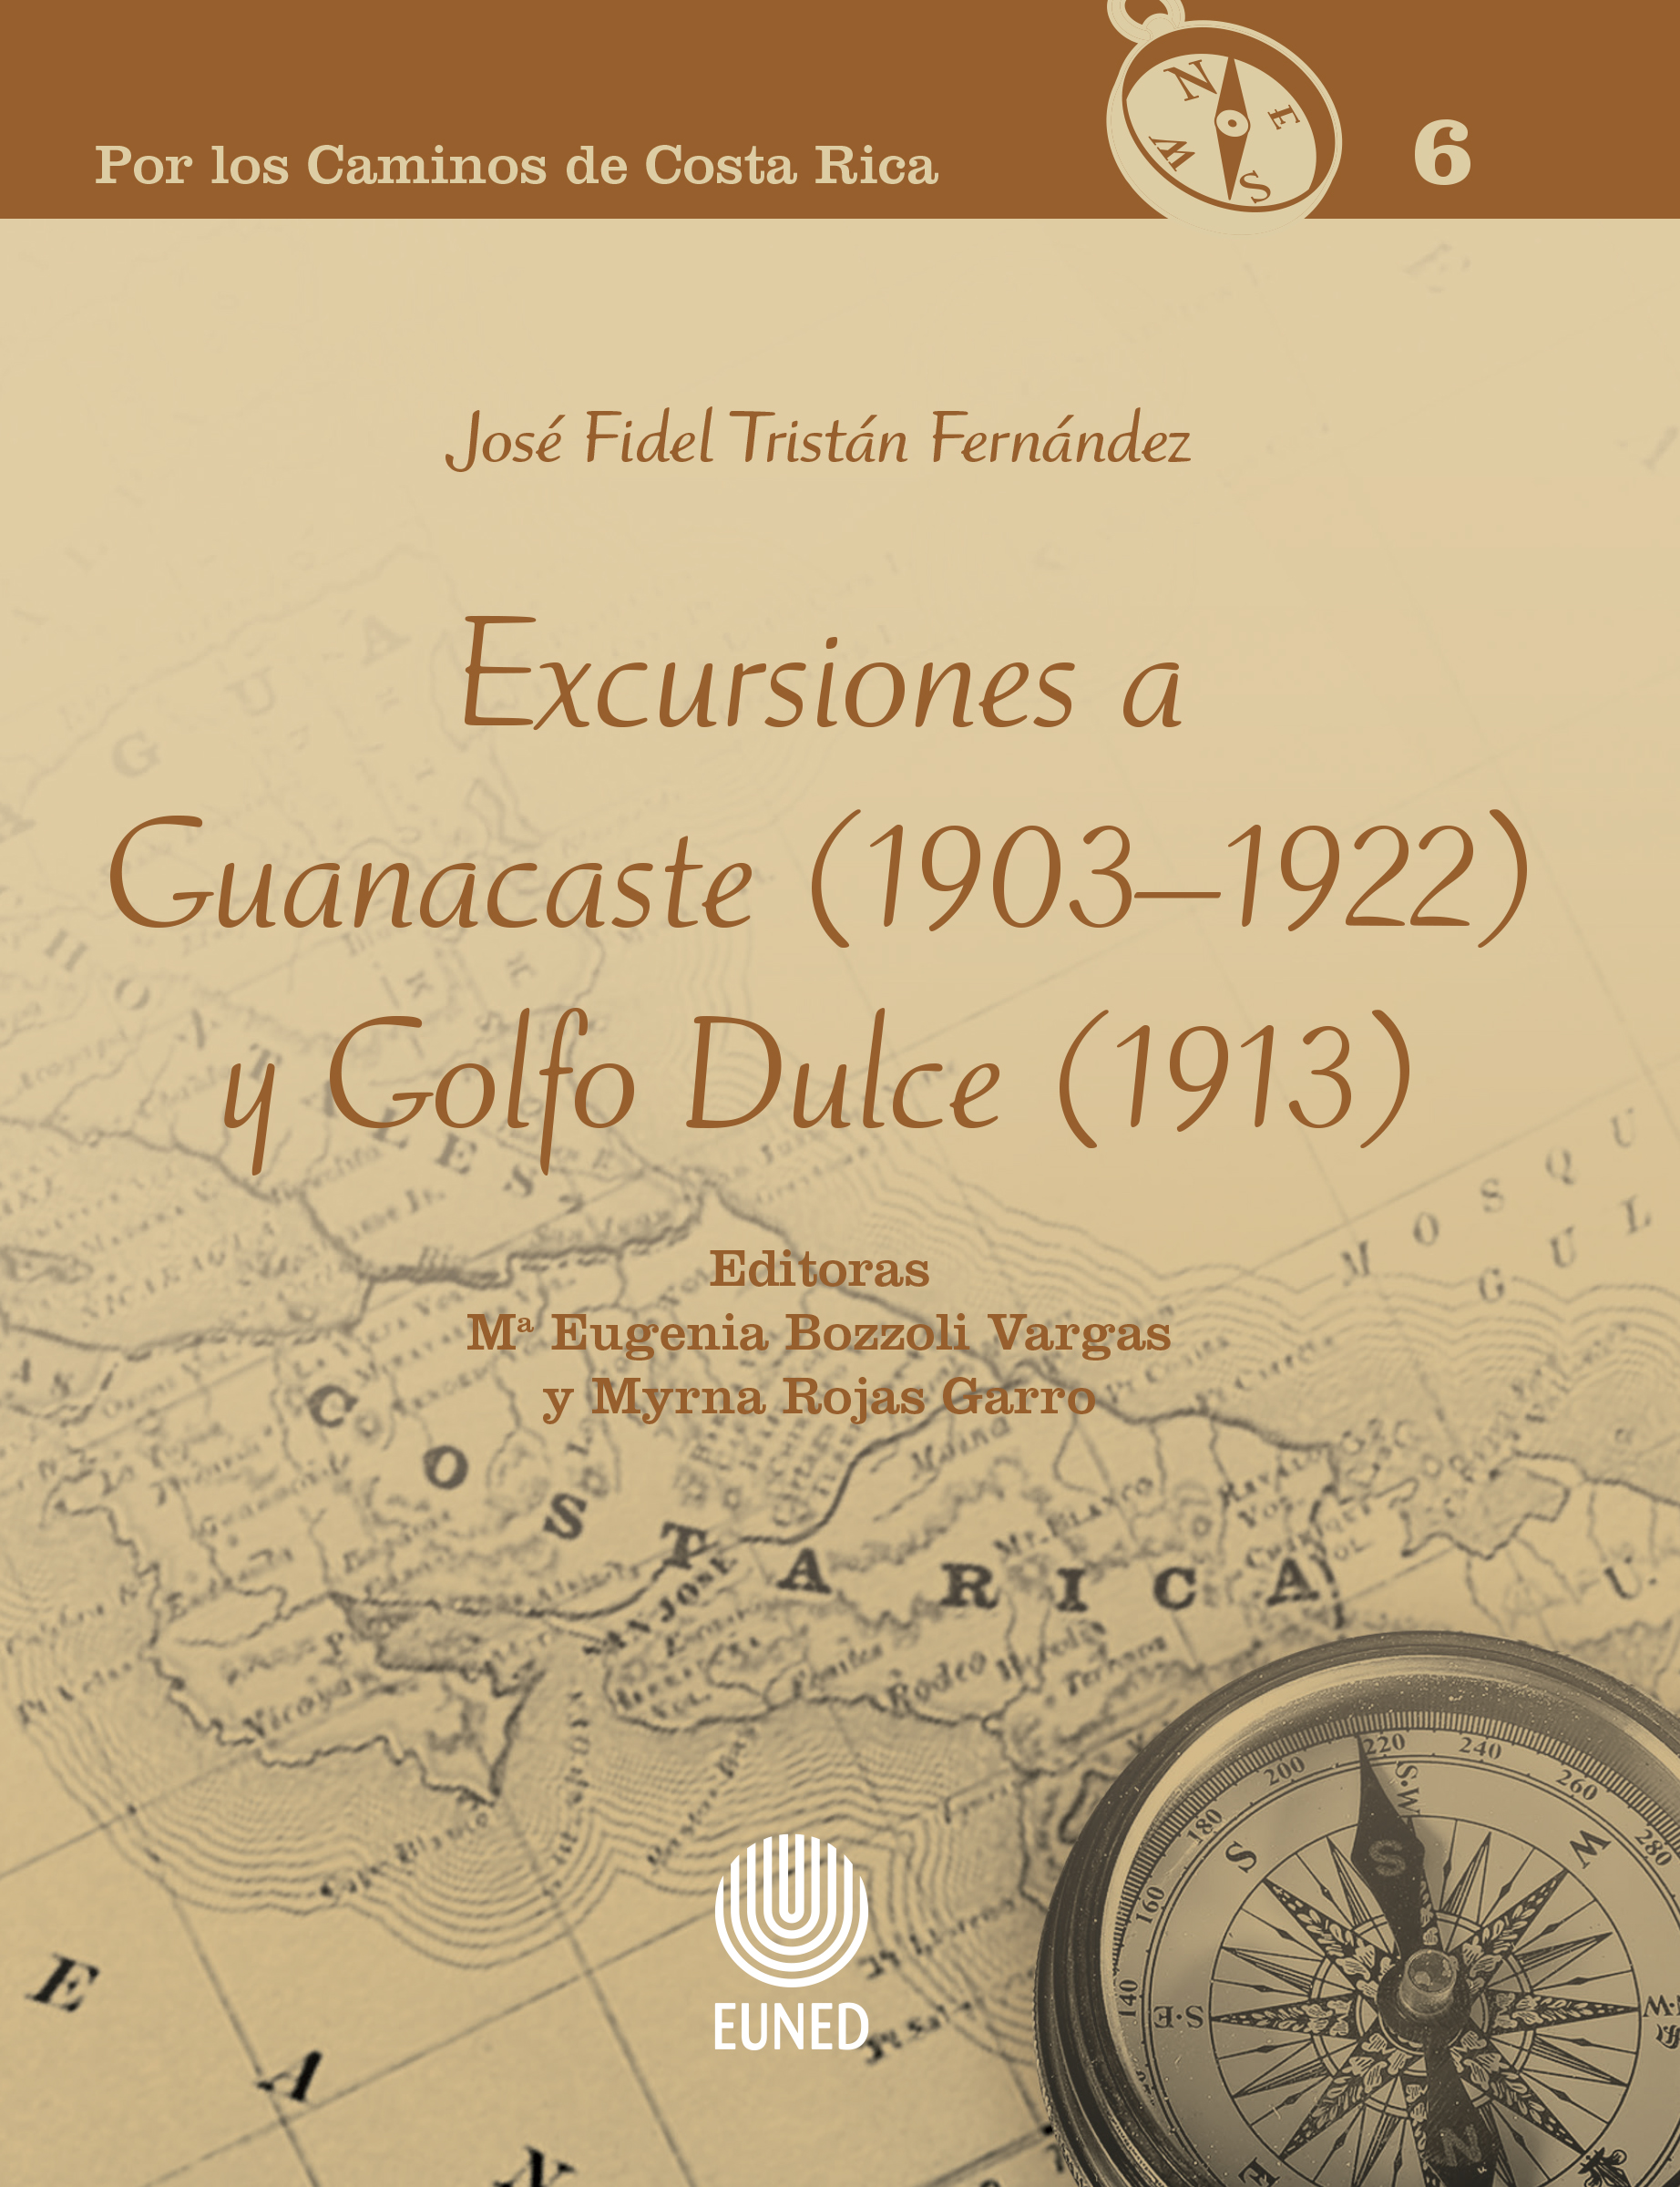 Excursiones a Guanacaste (1903-1922) y Golfo Dulce (1913)